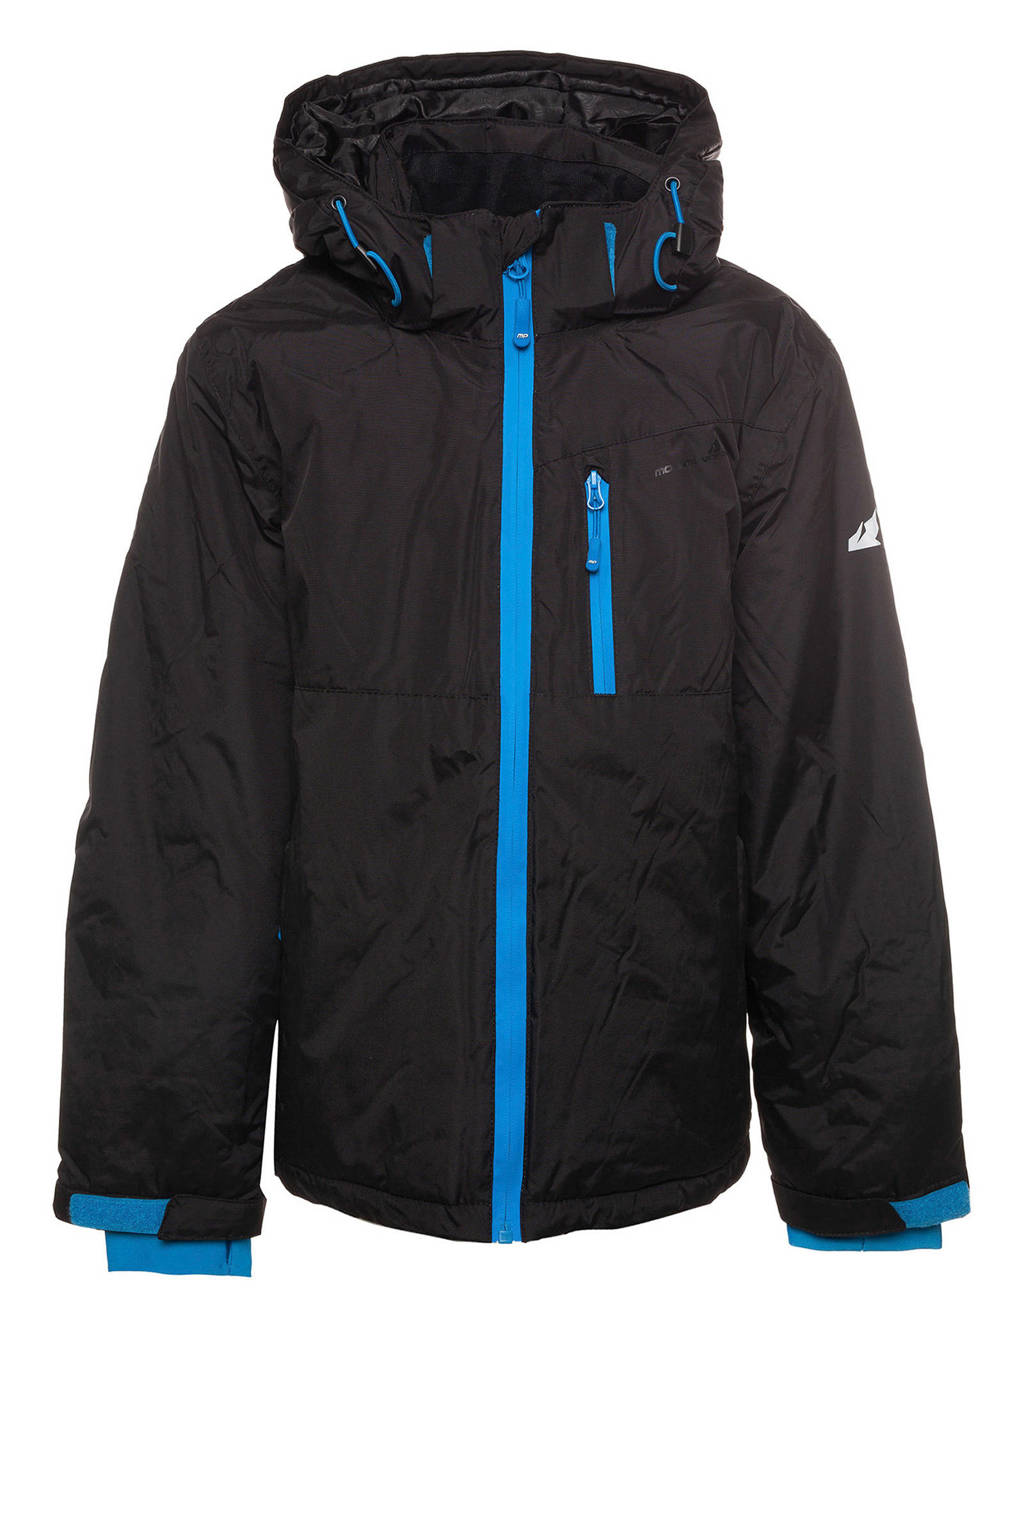 Scapino Mountain Peak ski-jack zwart/blauw, Zwart